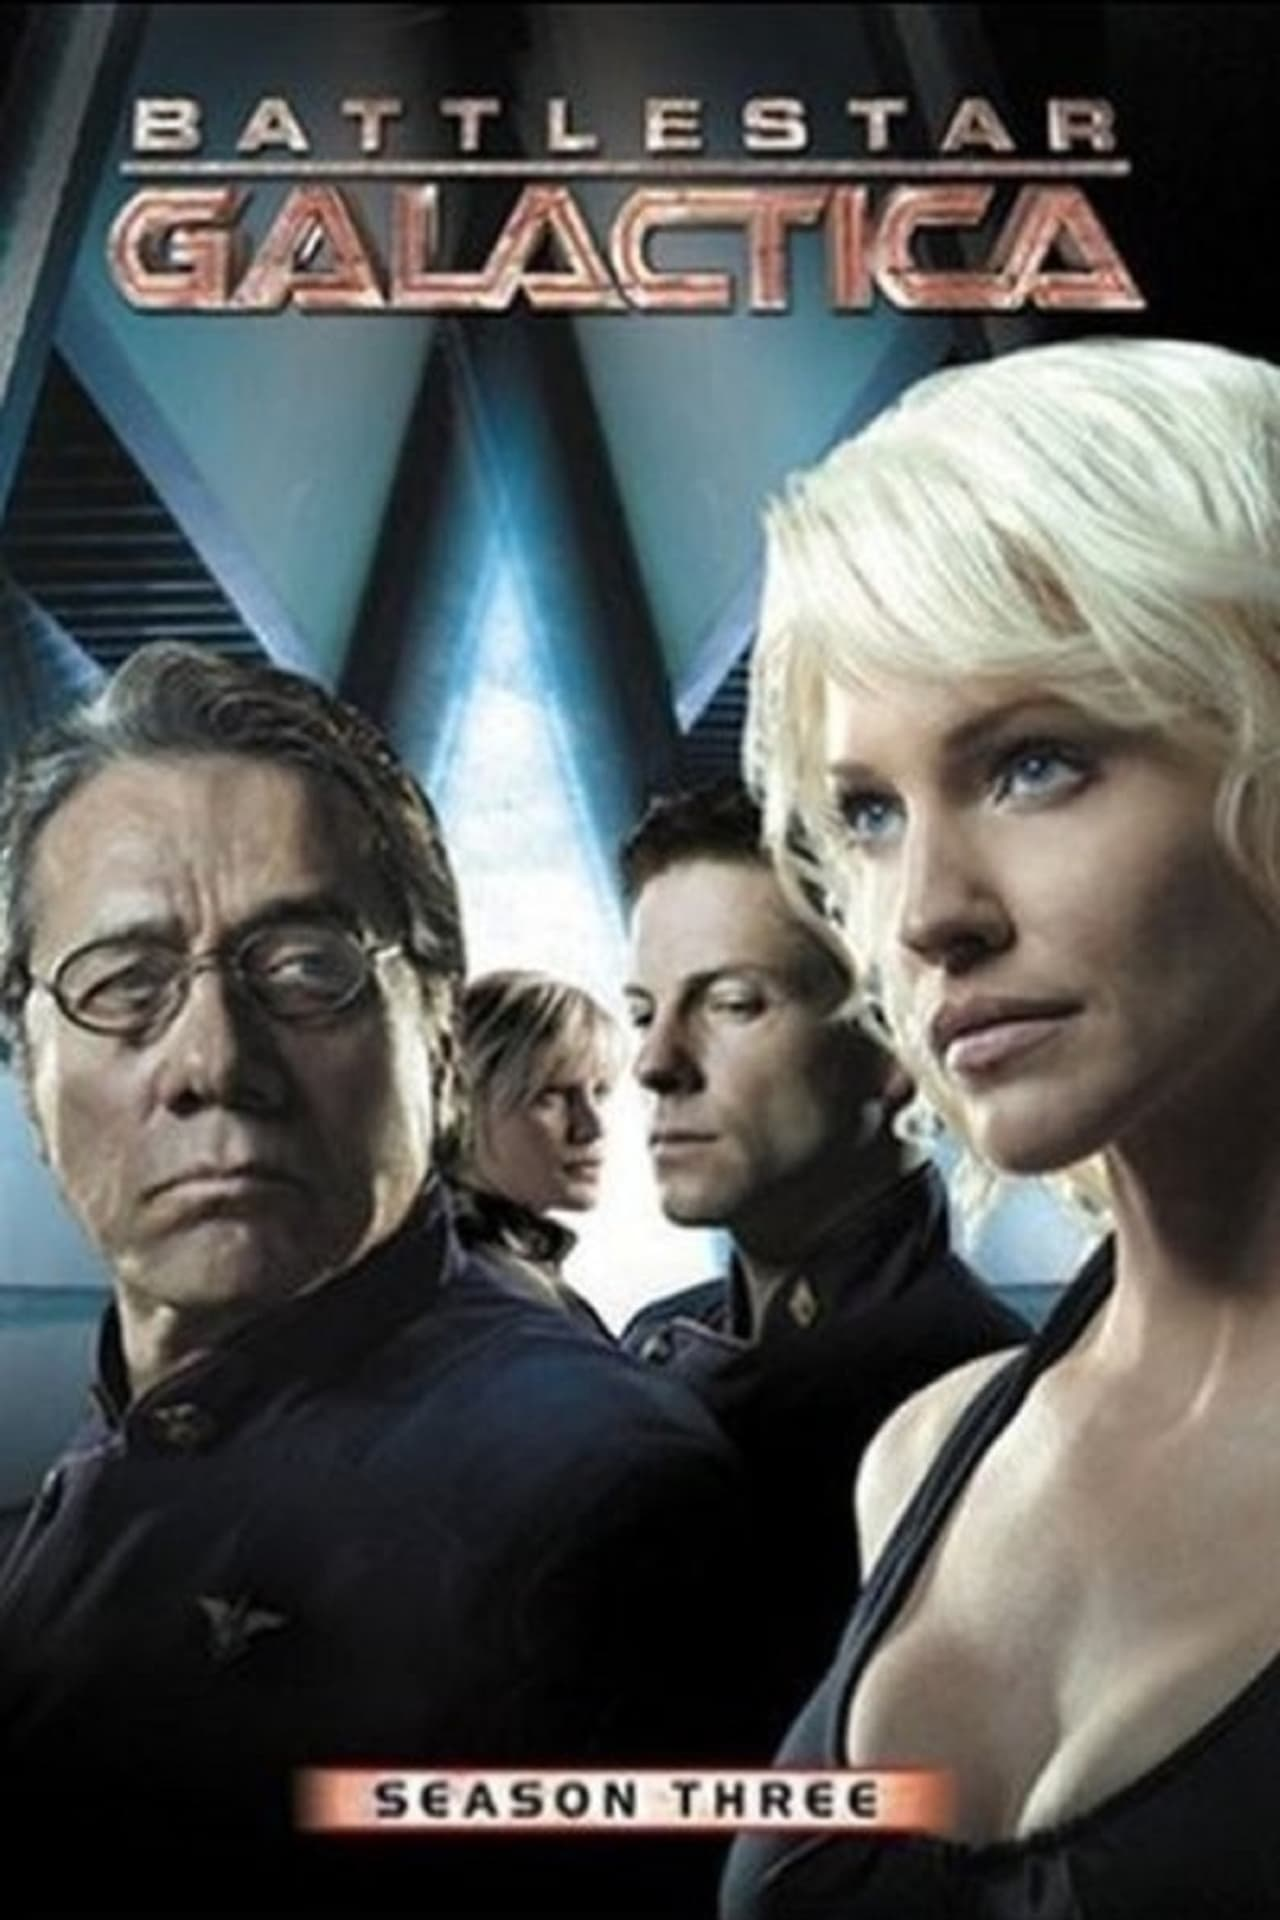 Putlocker Battlestar Galactica Season 3 (2006)